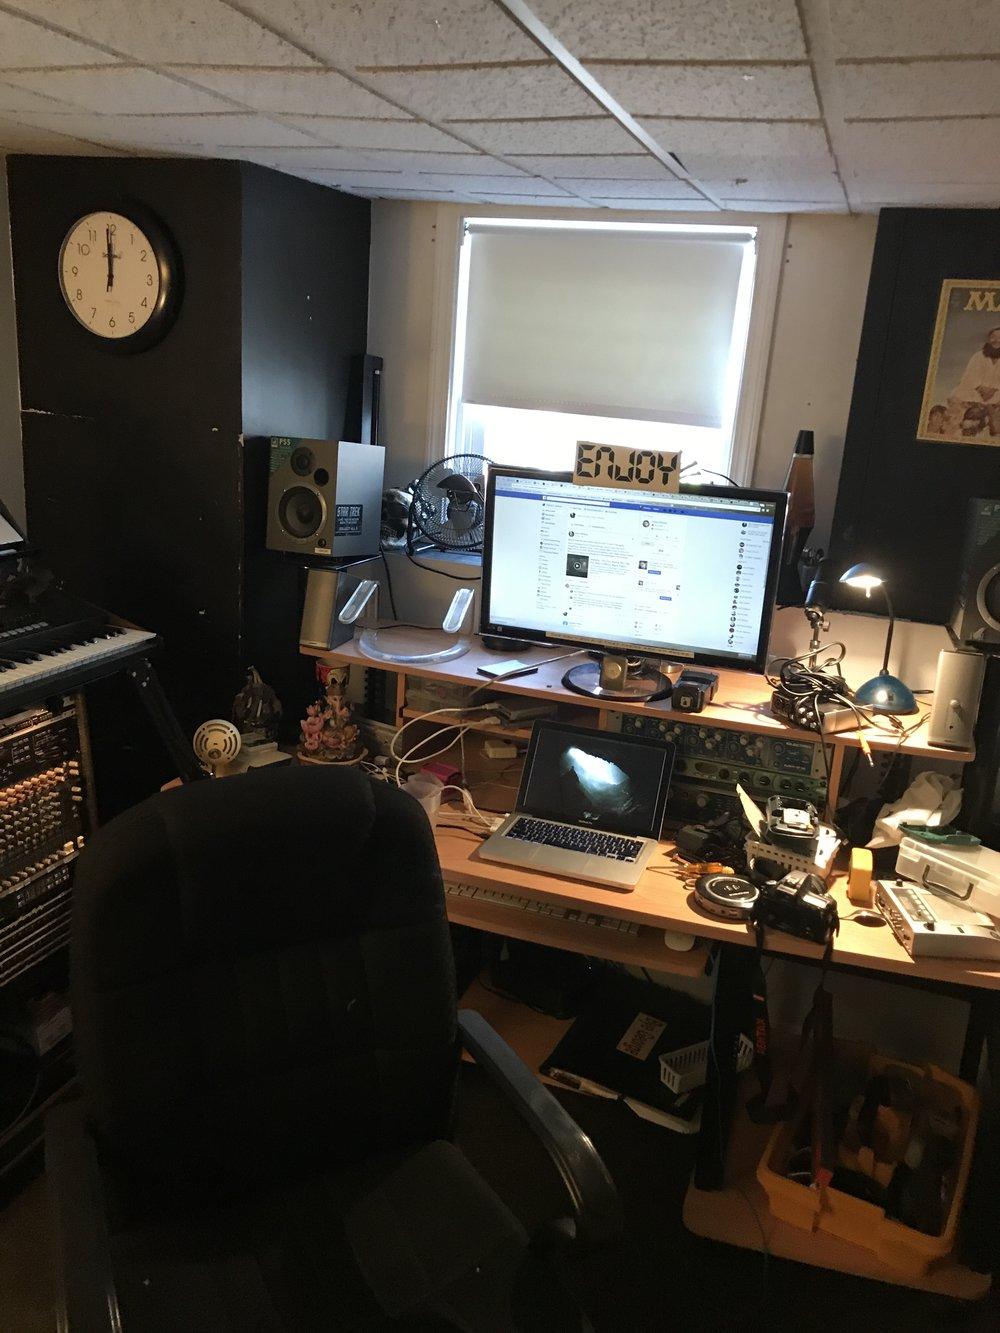 Messy desk shot